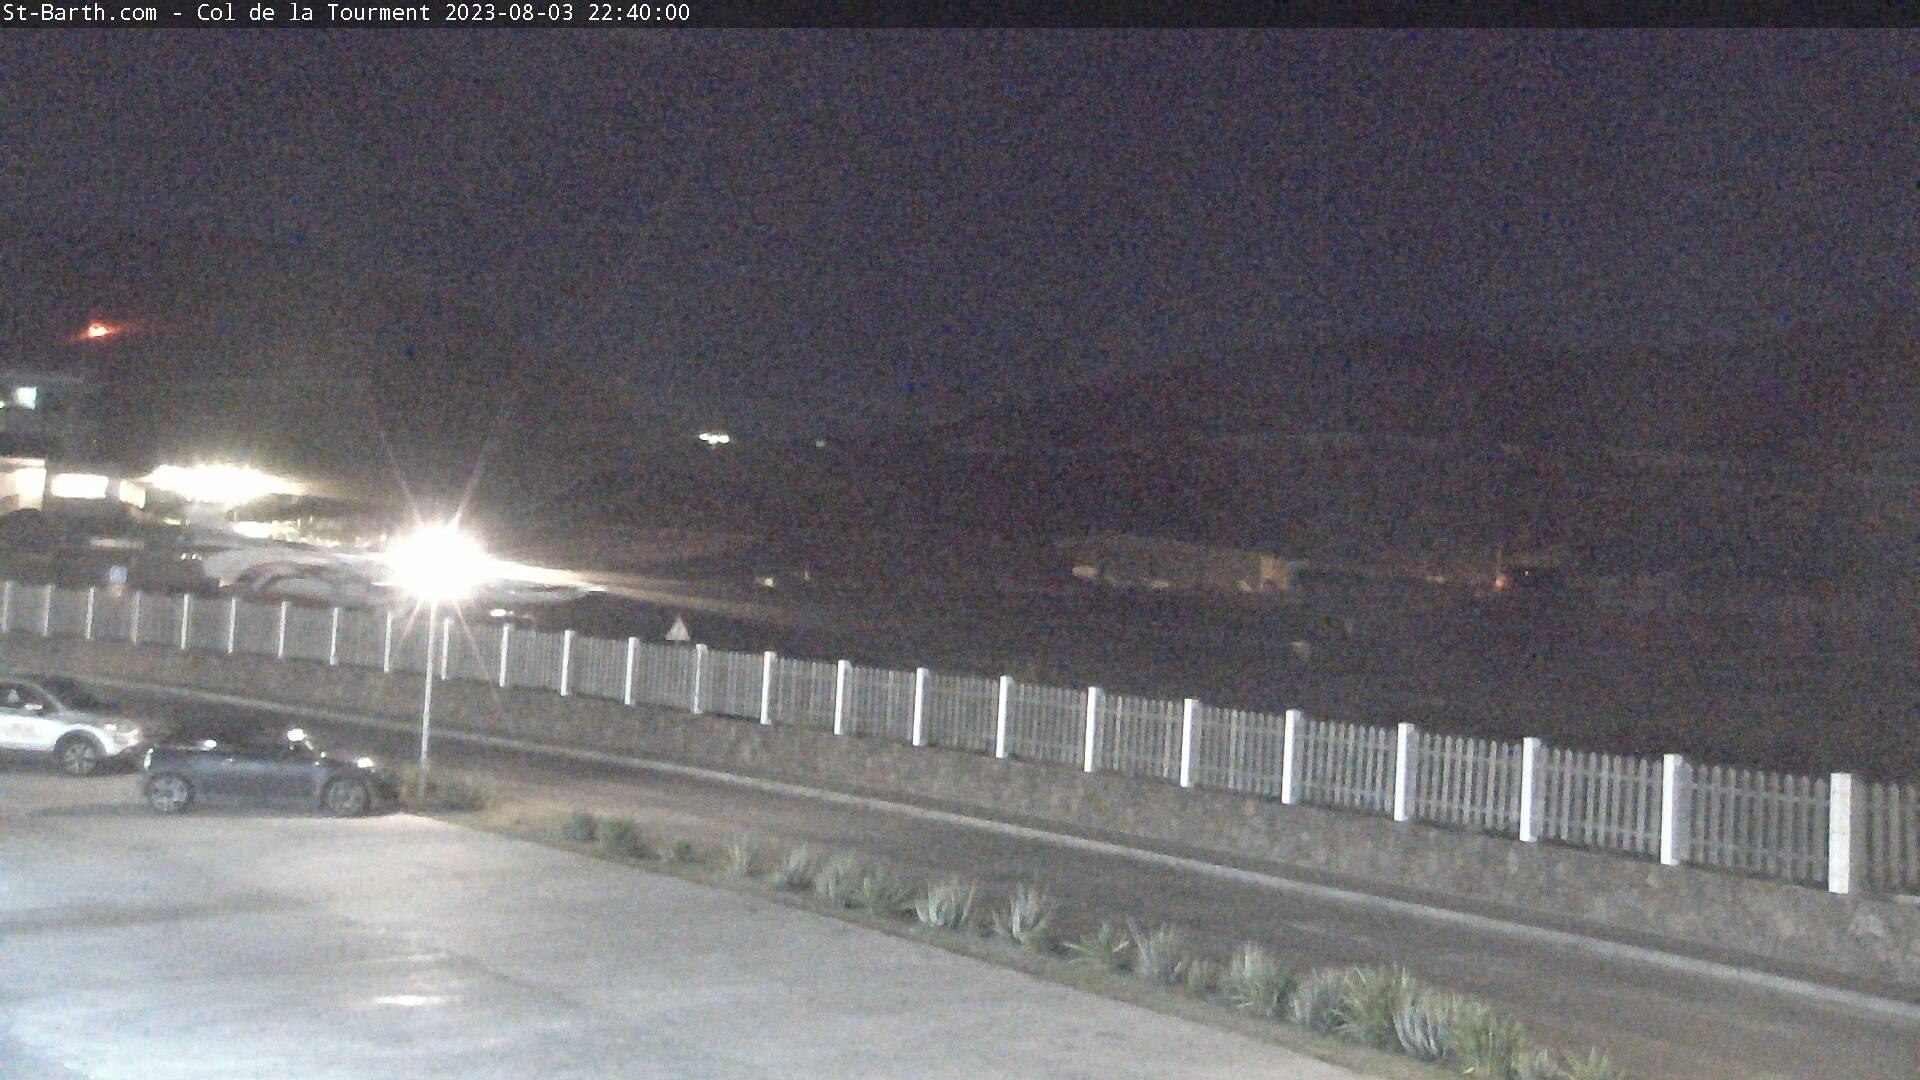 St Barth - St-Barth.com - Aéroport Gustav III - Webcam